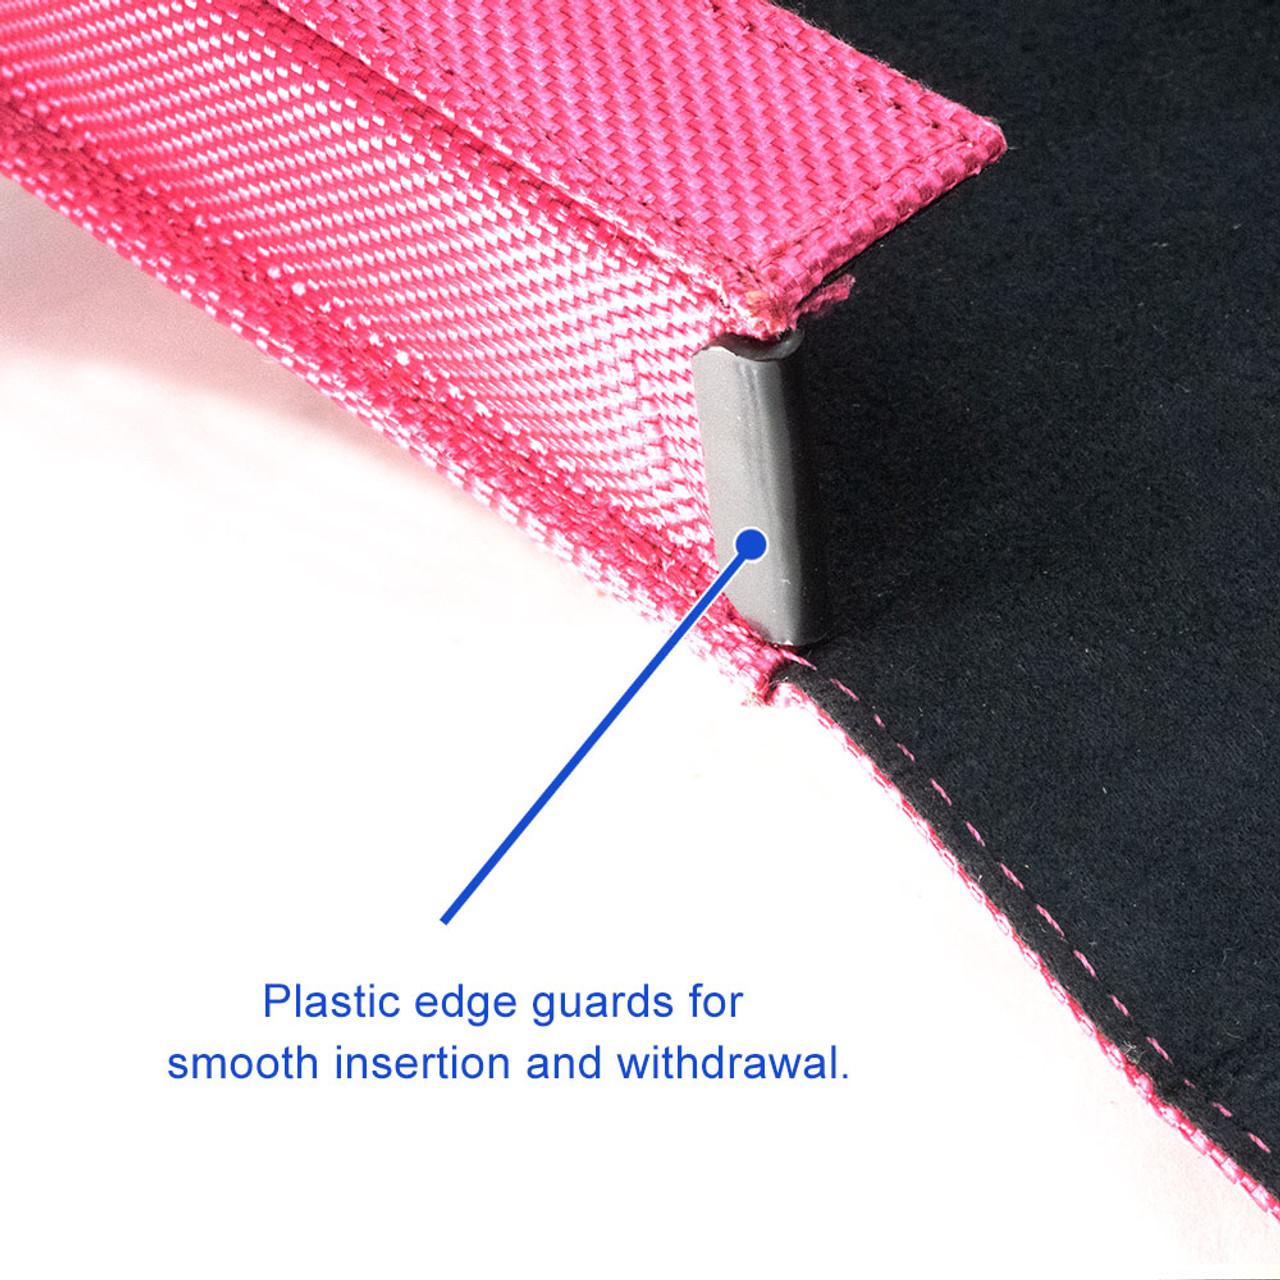 HK VP9 Pink Covert Series Holster